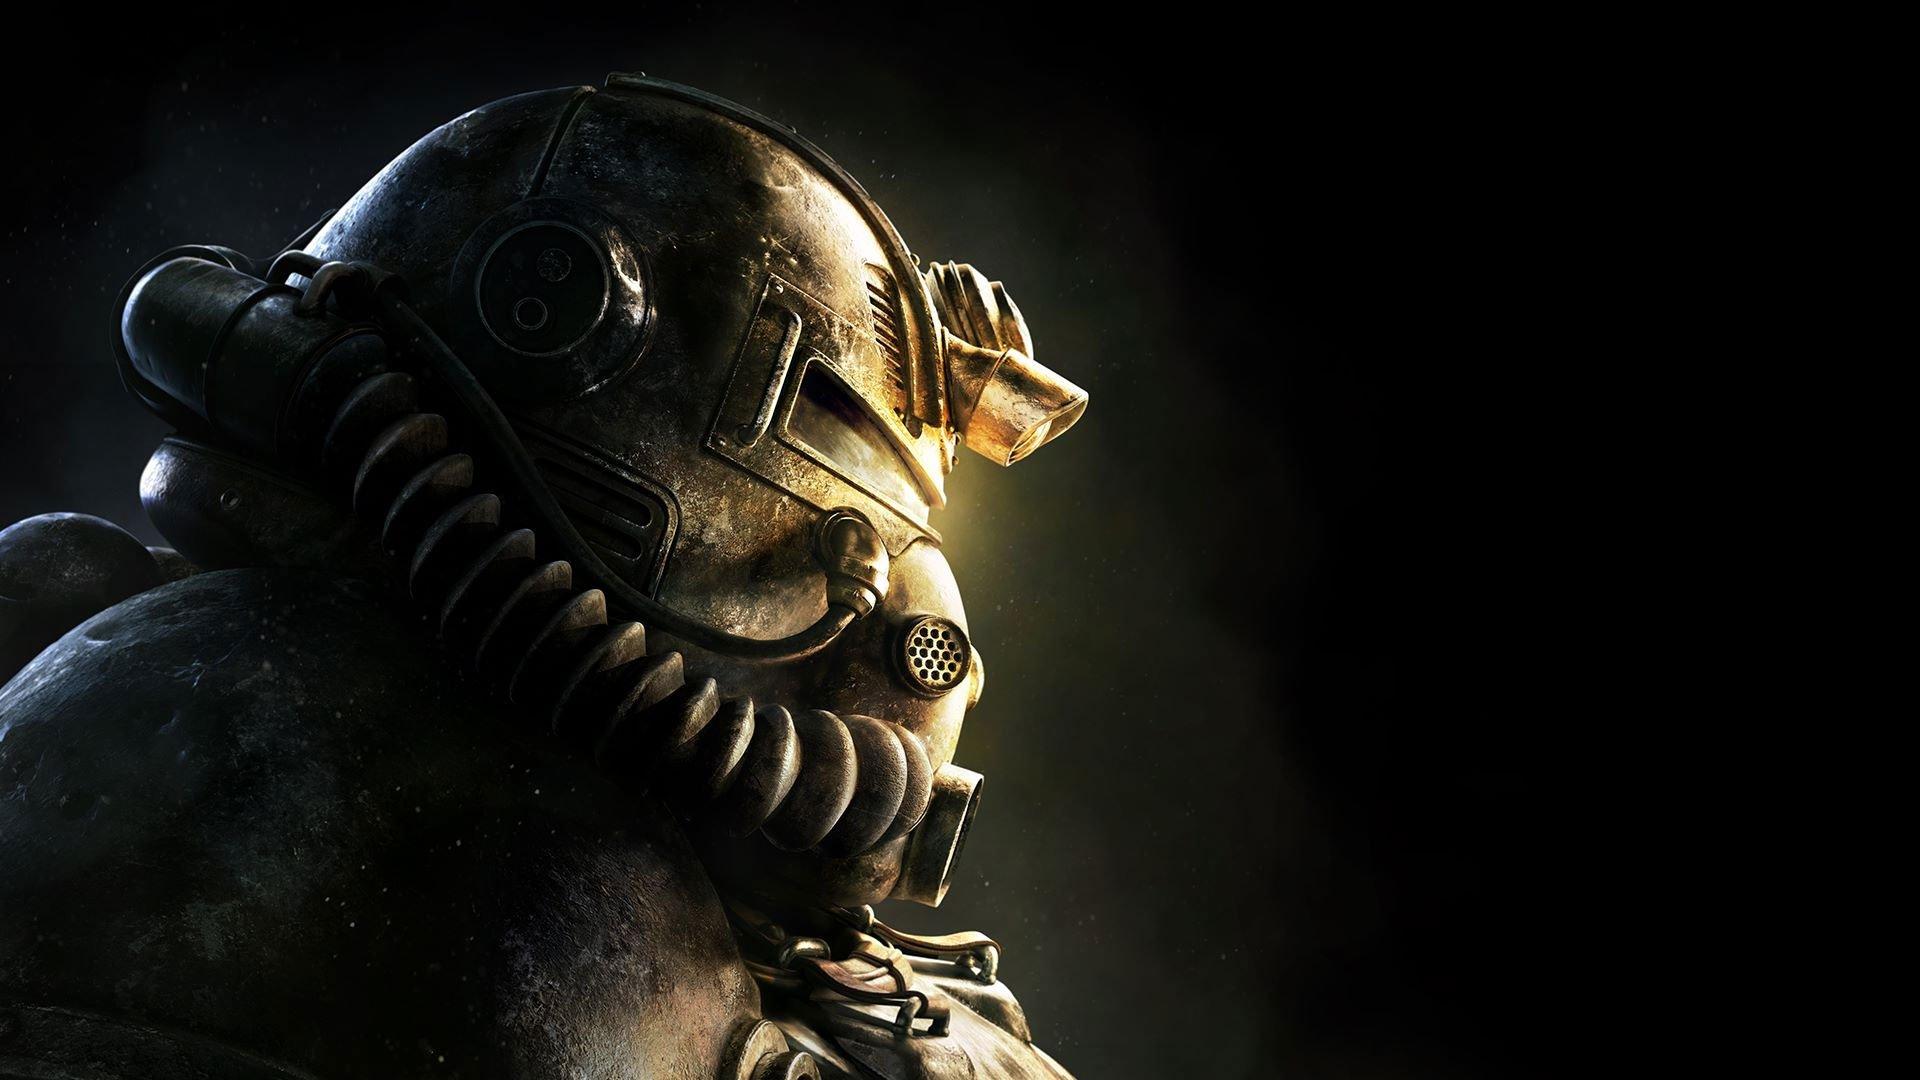 Bethesda support leaks Fallout 76 customer names, addresses & phone numbers. https://t.co/91oQzwi1qz https://t.co/XOIzqkunUP